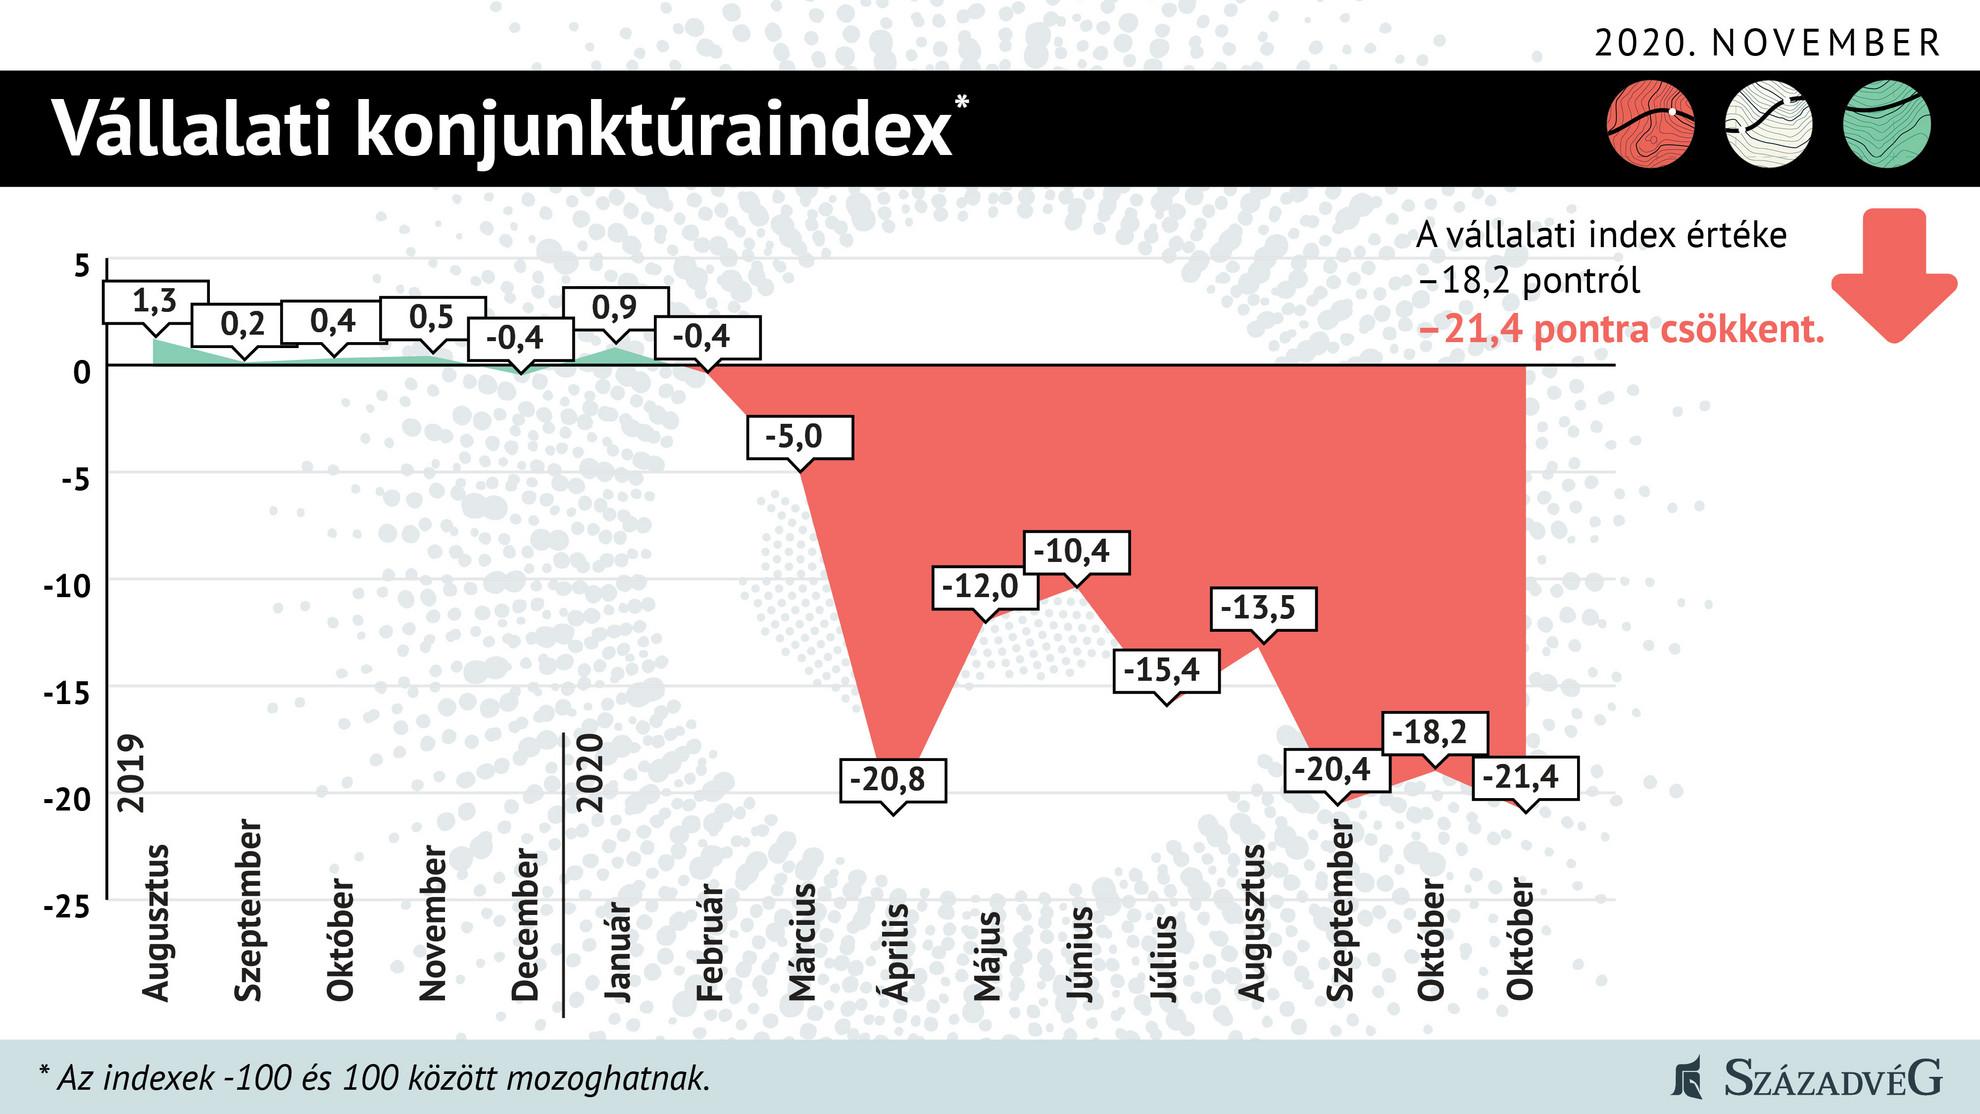 Vállalati konjunktúraindex